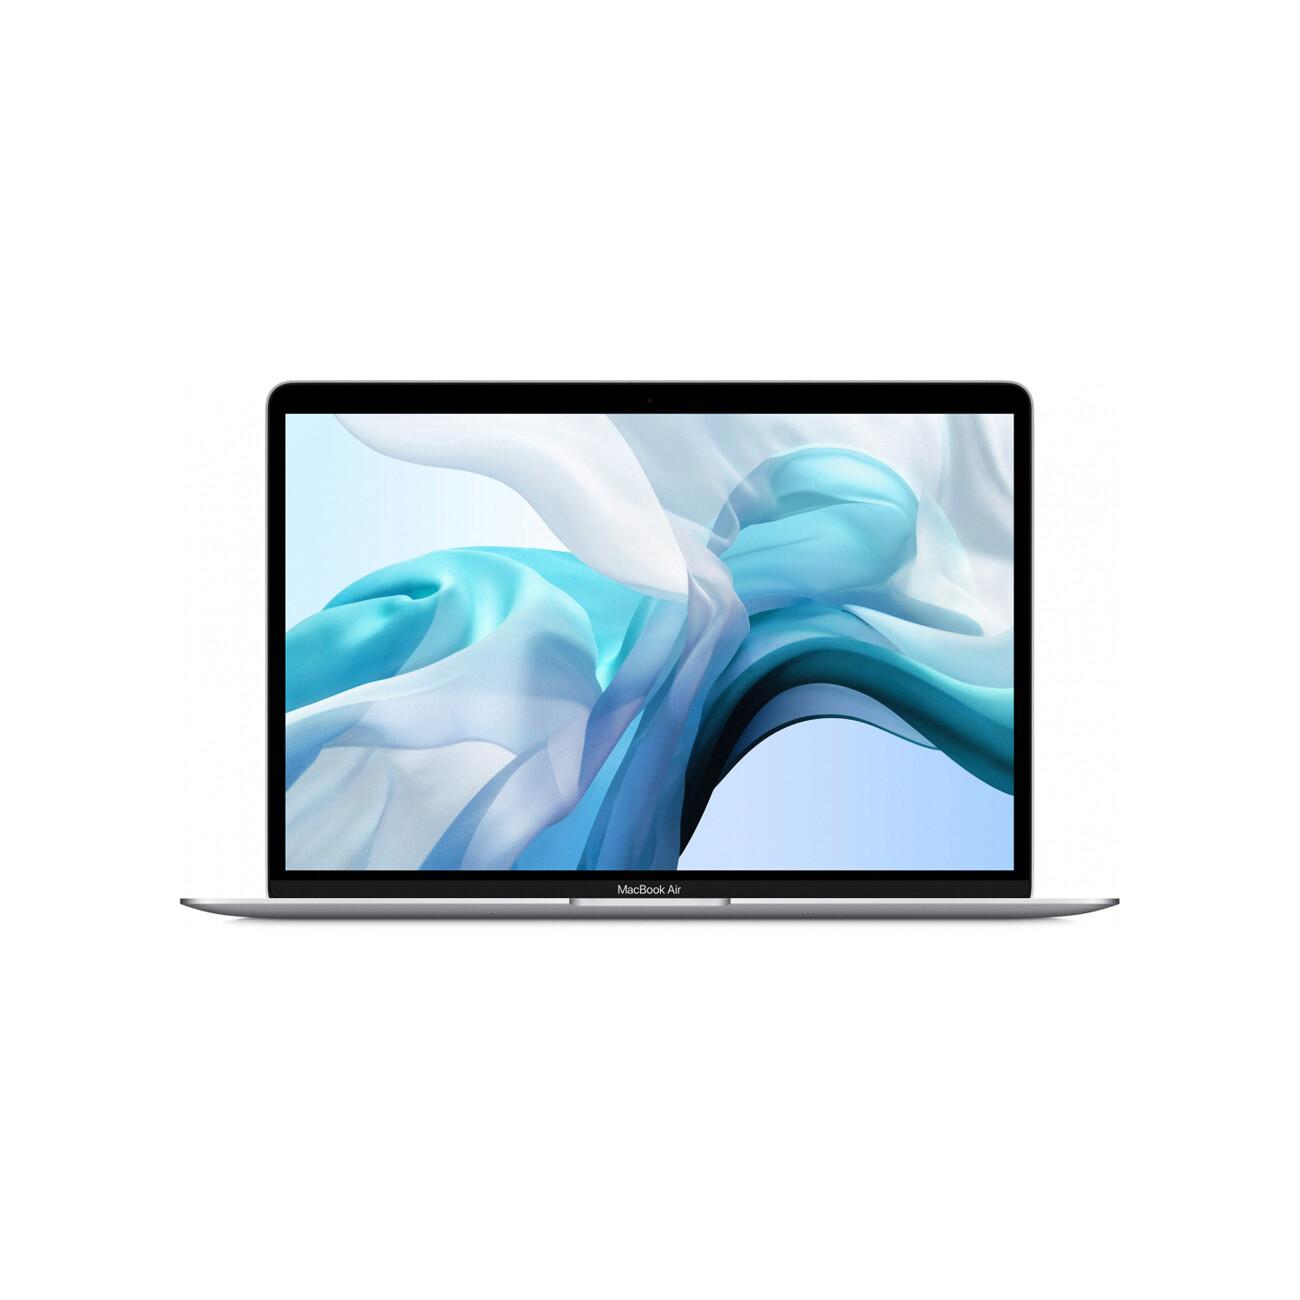 "Apple MacBook Air 13"" Dual Core i3 1,1 ГГц, 8 ГБ, 256 ГБ SSD, серебристый"